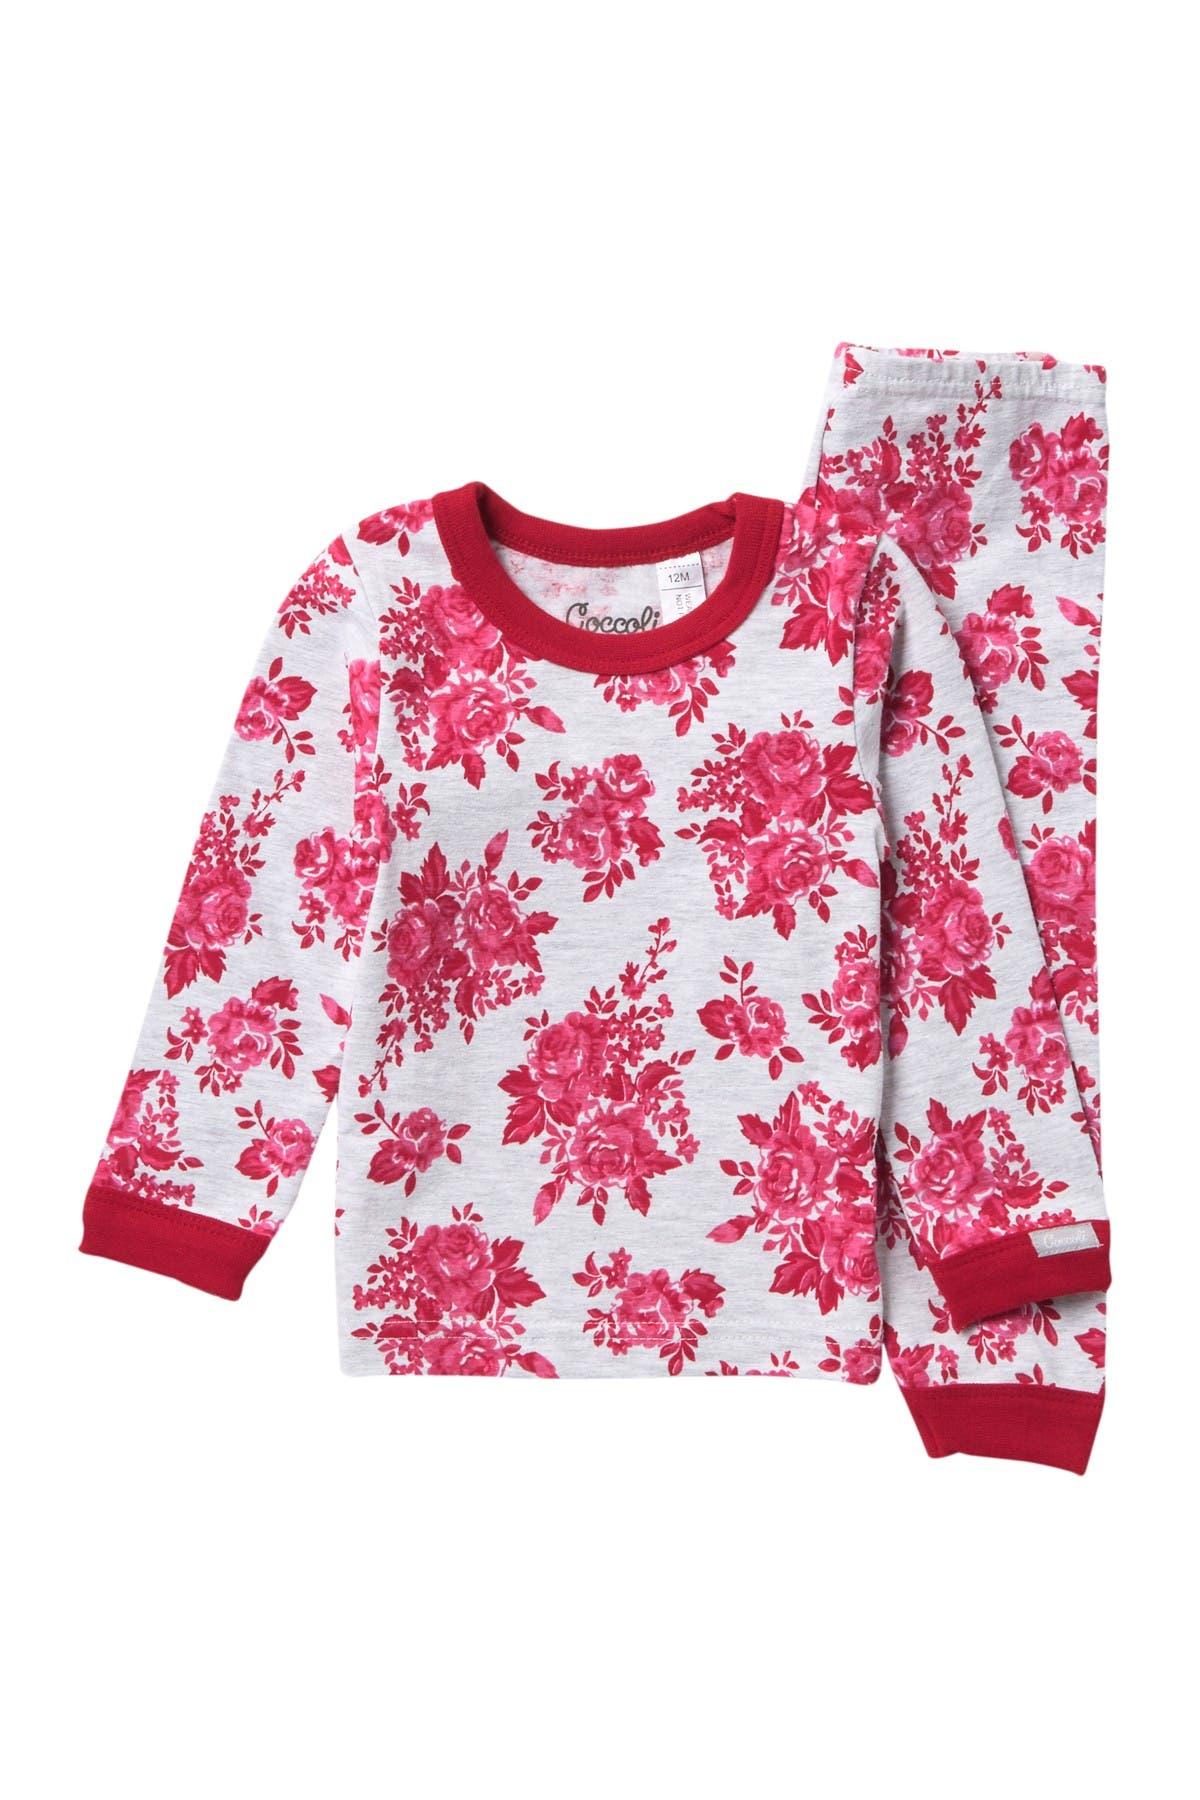 Image of Coccoli Floral Heathered Pajama Set